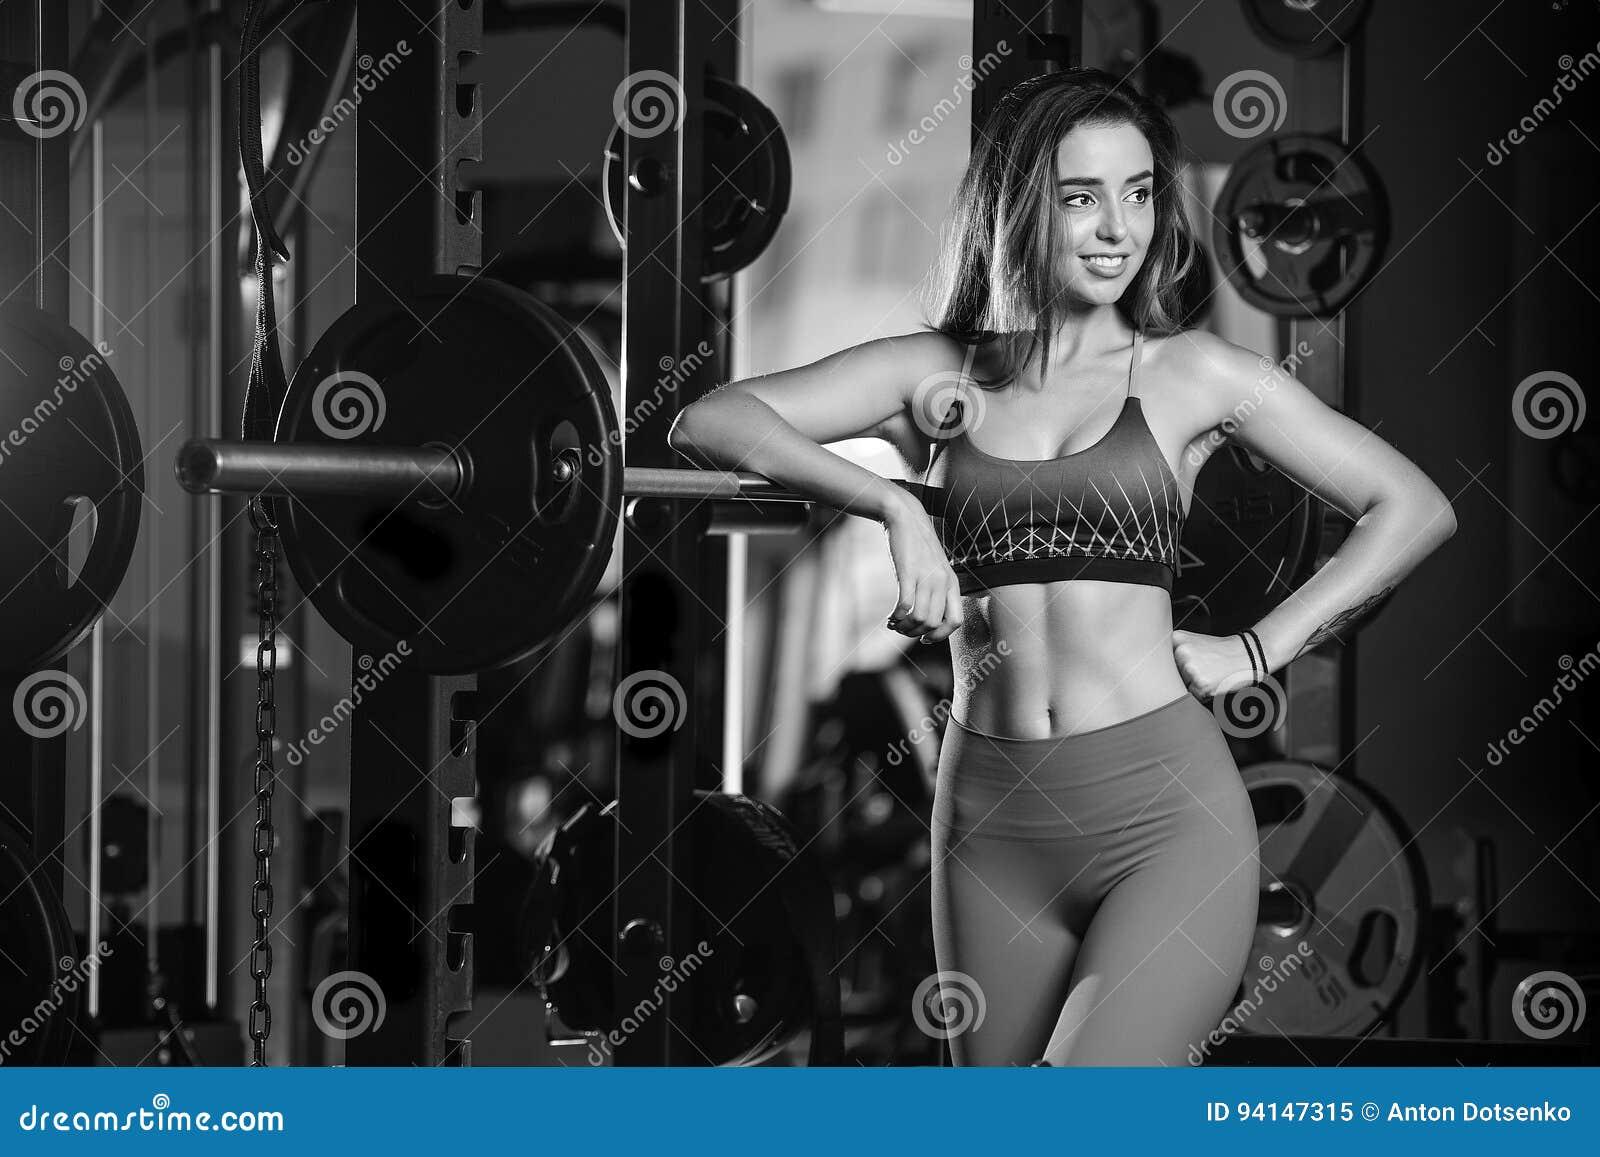 Sexy anotomy girls photo images 555